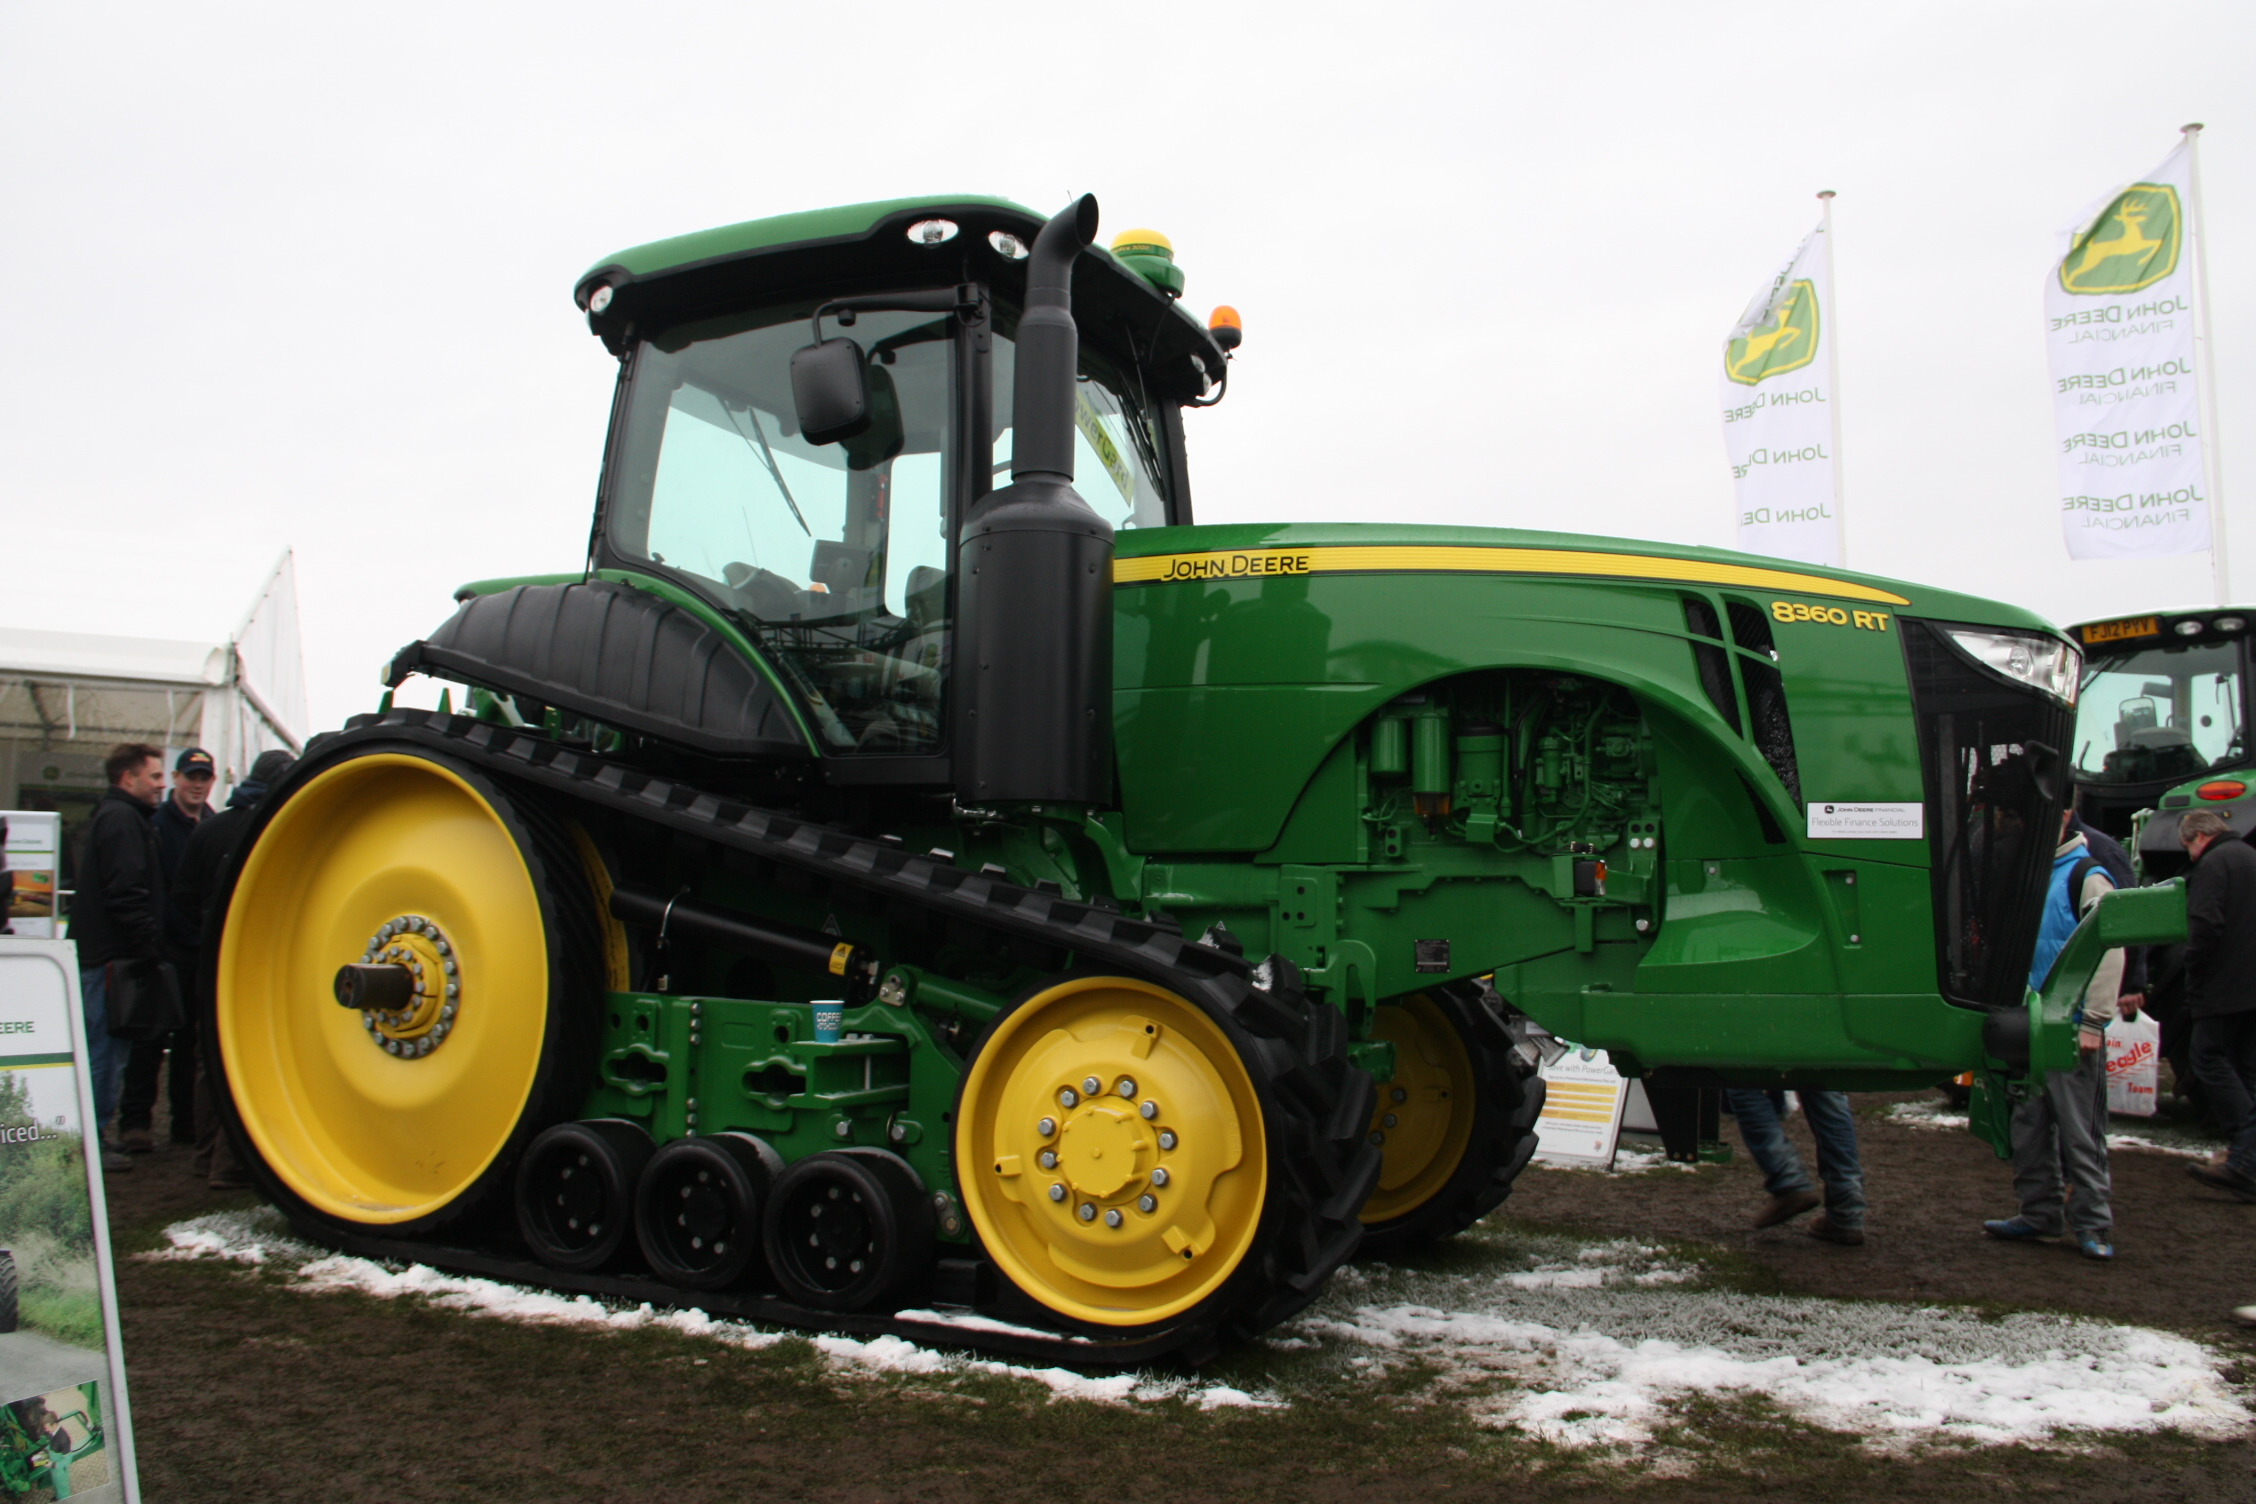 john deere 8360 rt - tractor & construction plant wiki